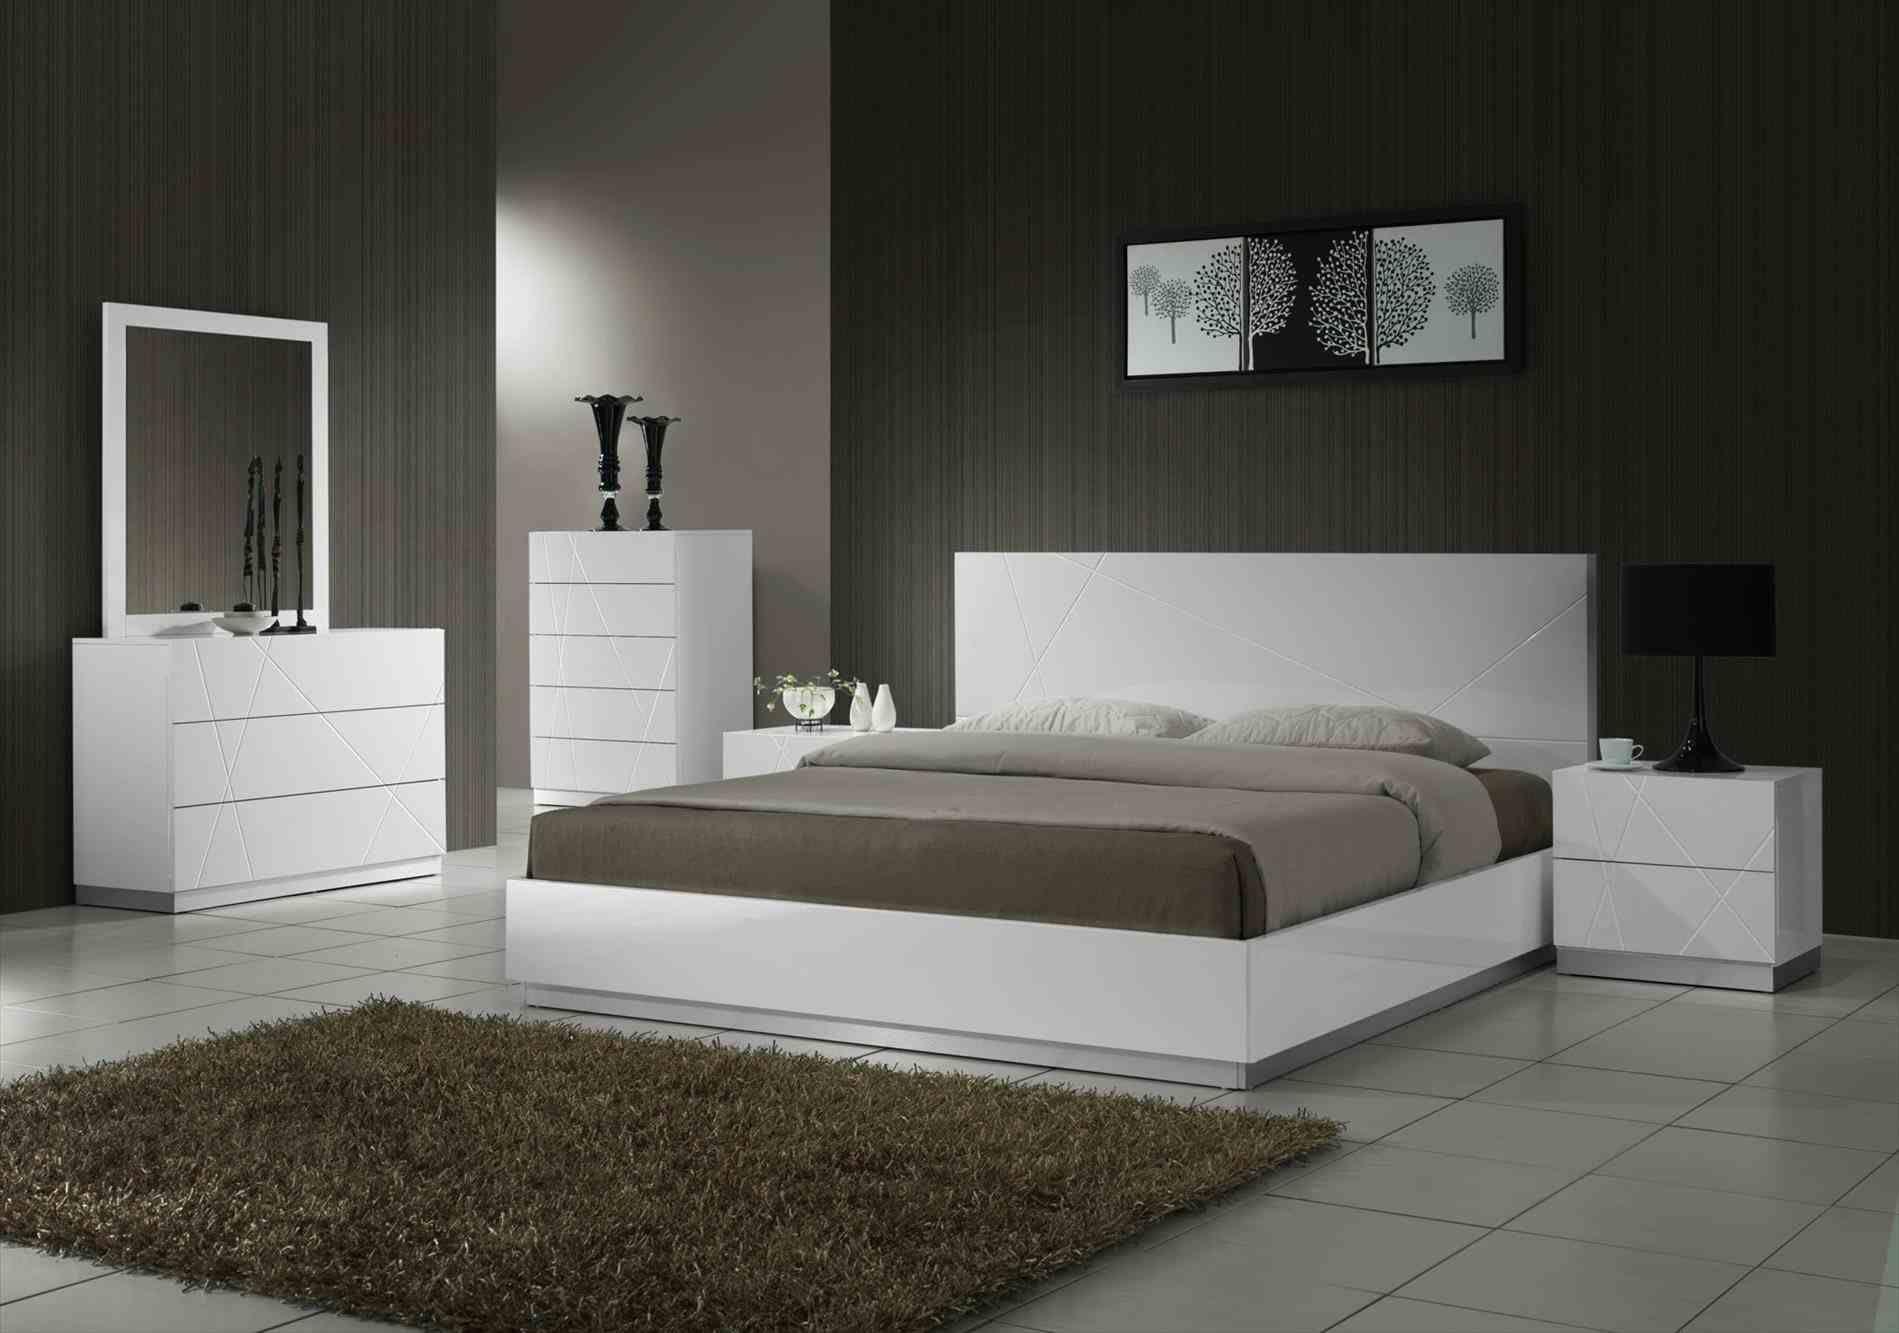 New Post modern bedroom furniture designs 2015 visit Bobayule ...